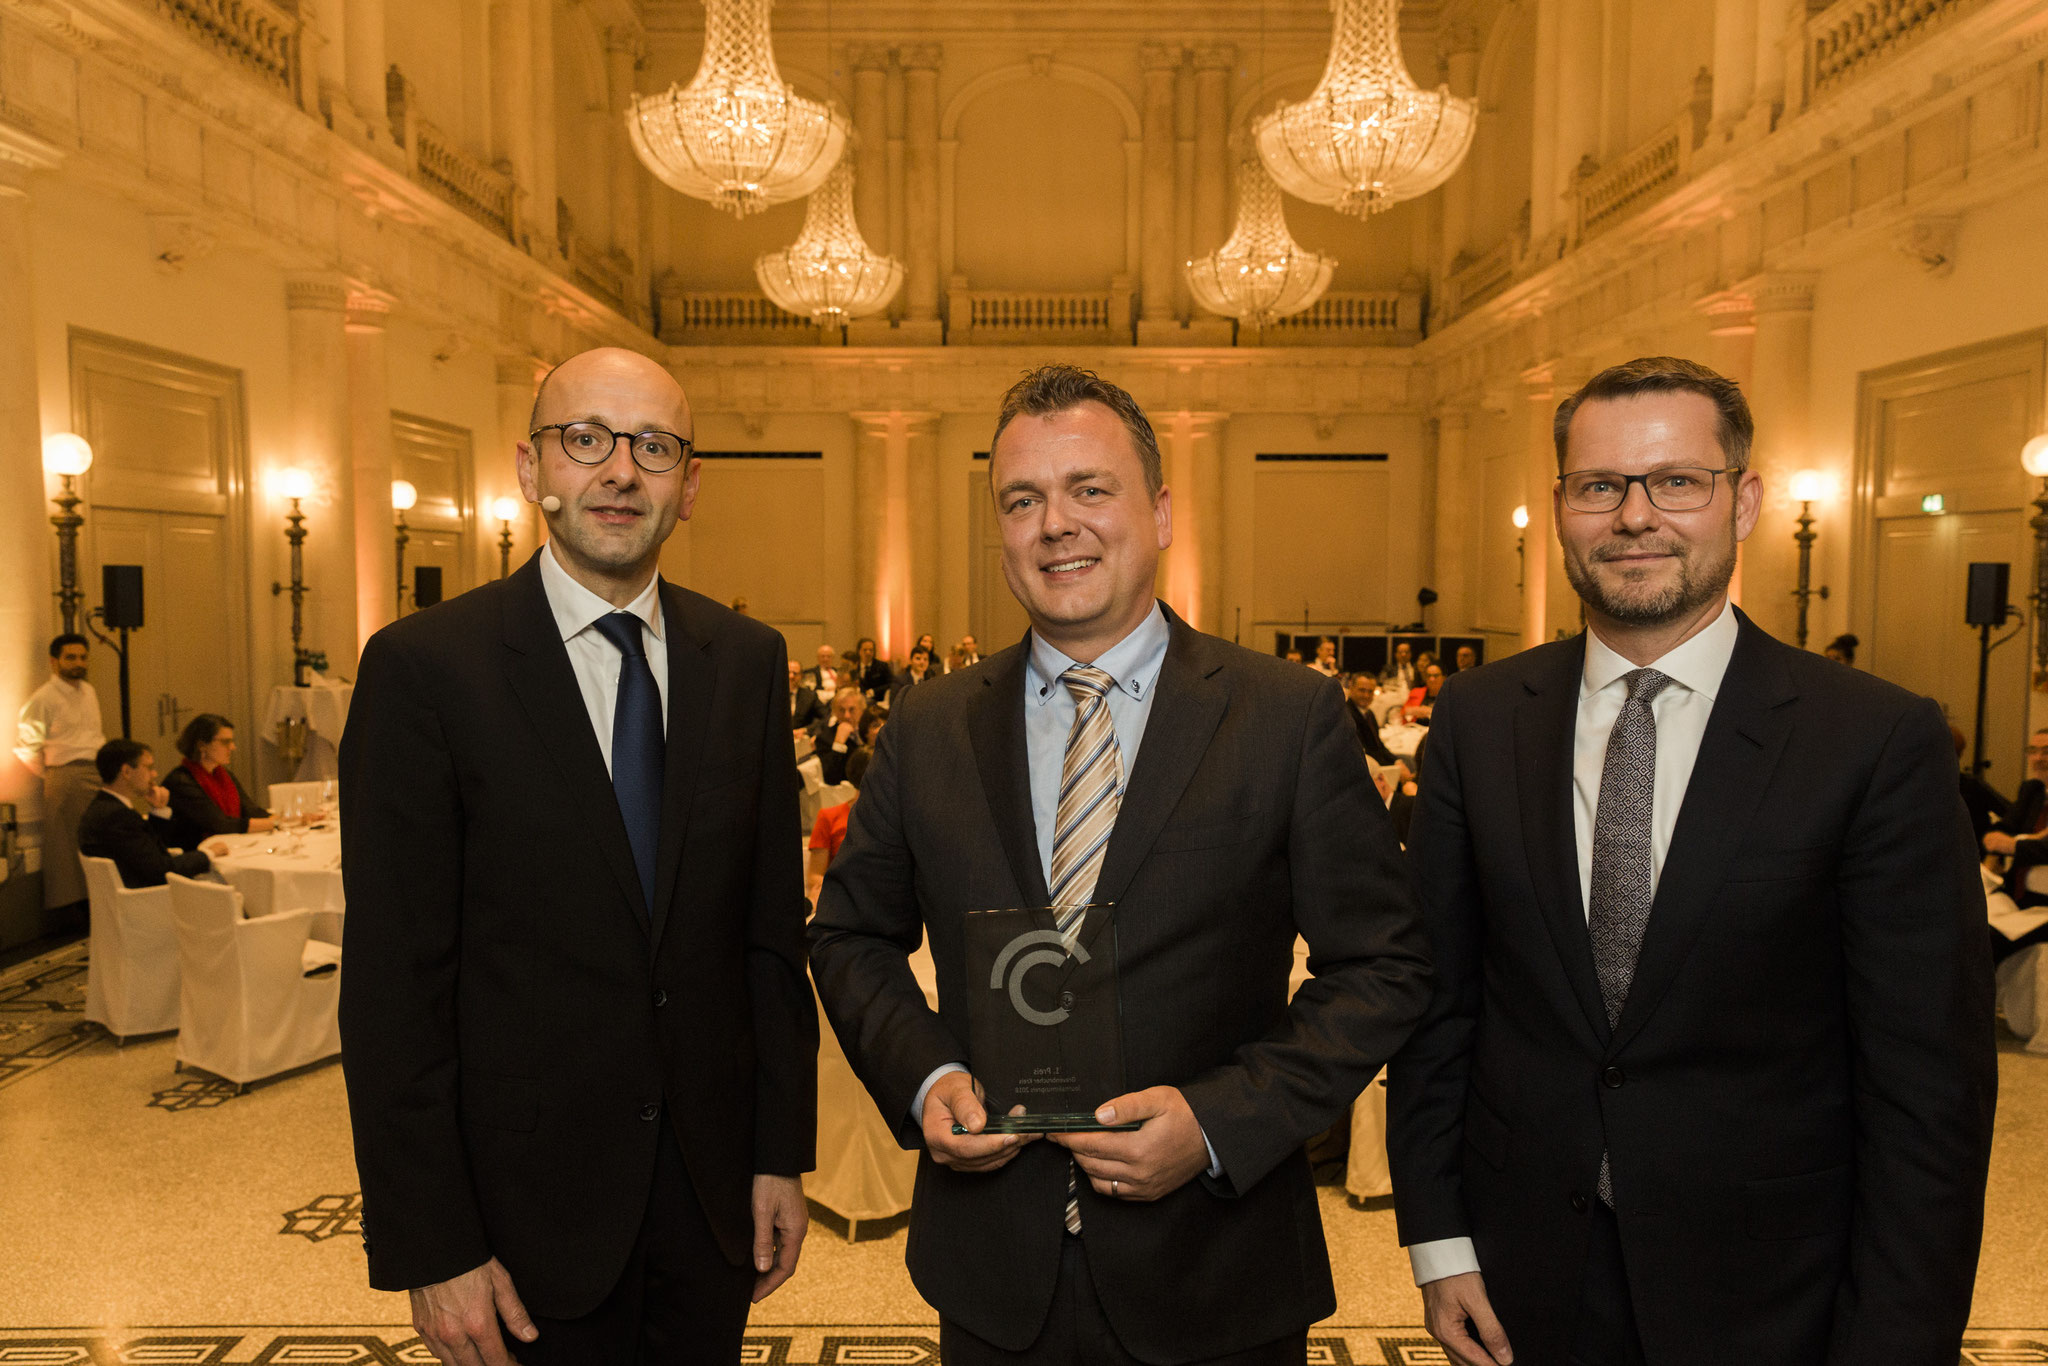 Lucas Flöther, Lars Petersen, first prize Journalism Award, Dirk Andres © 2018 Sven Döring